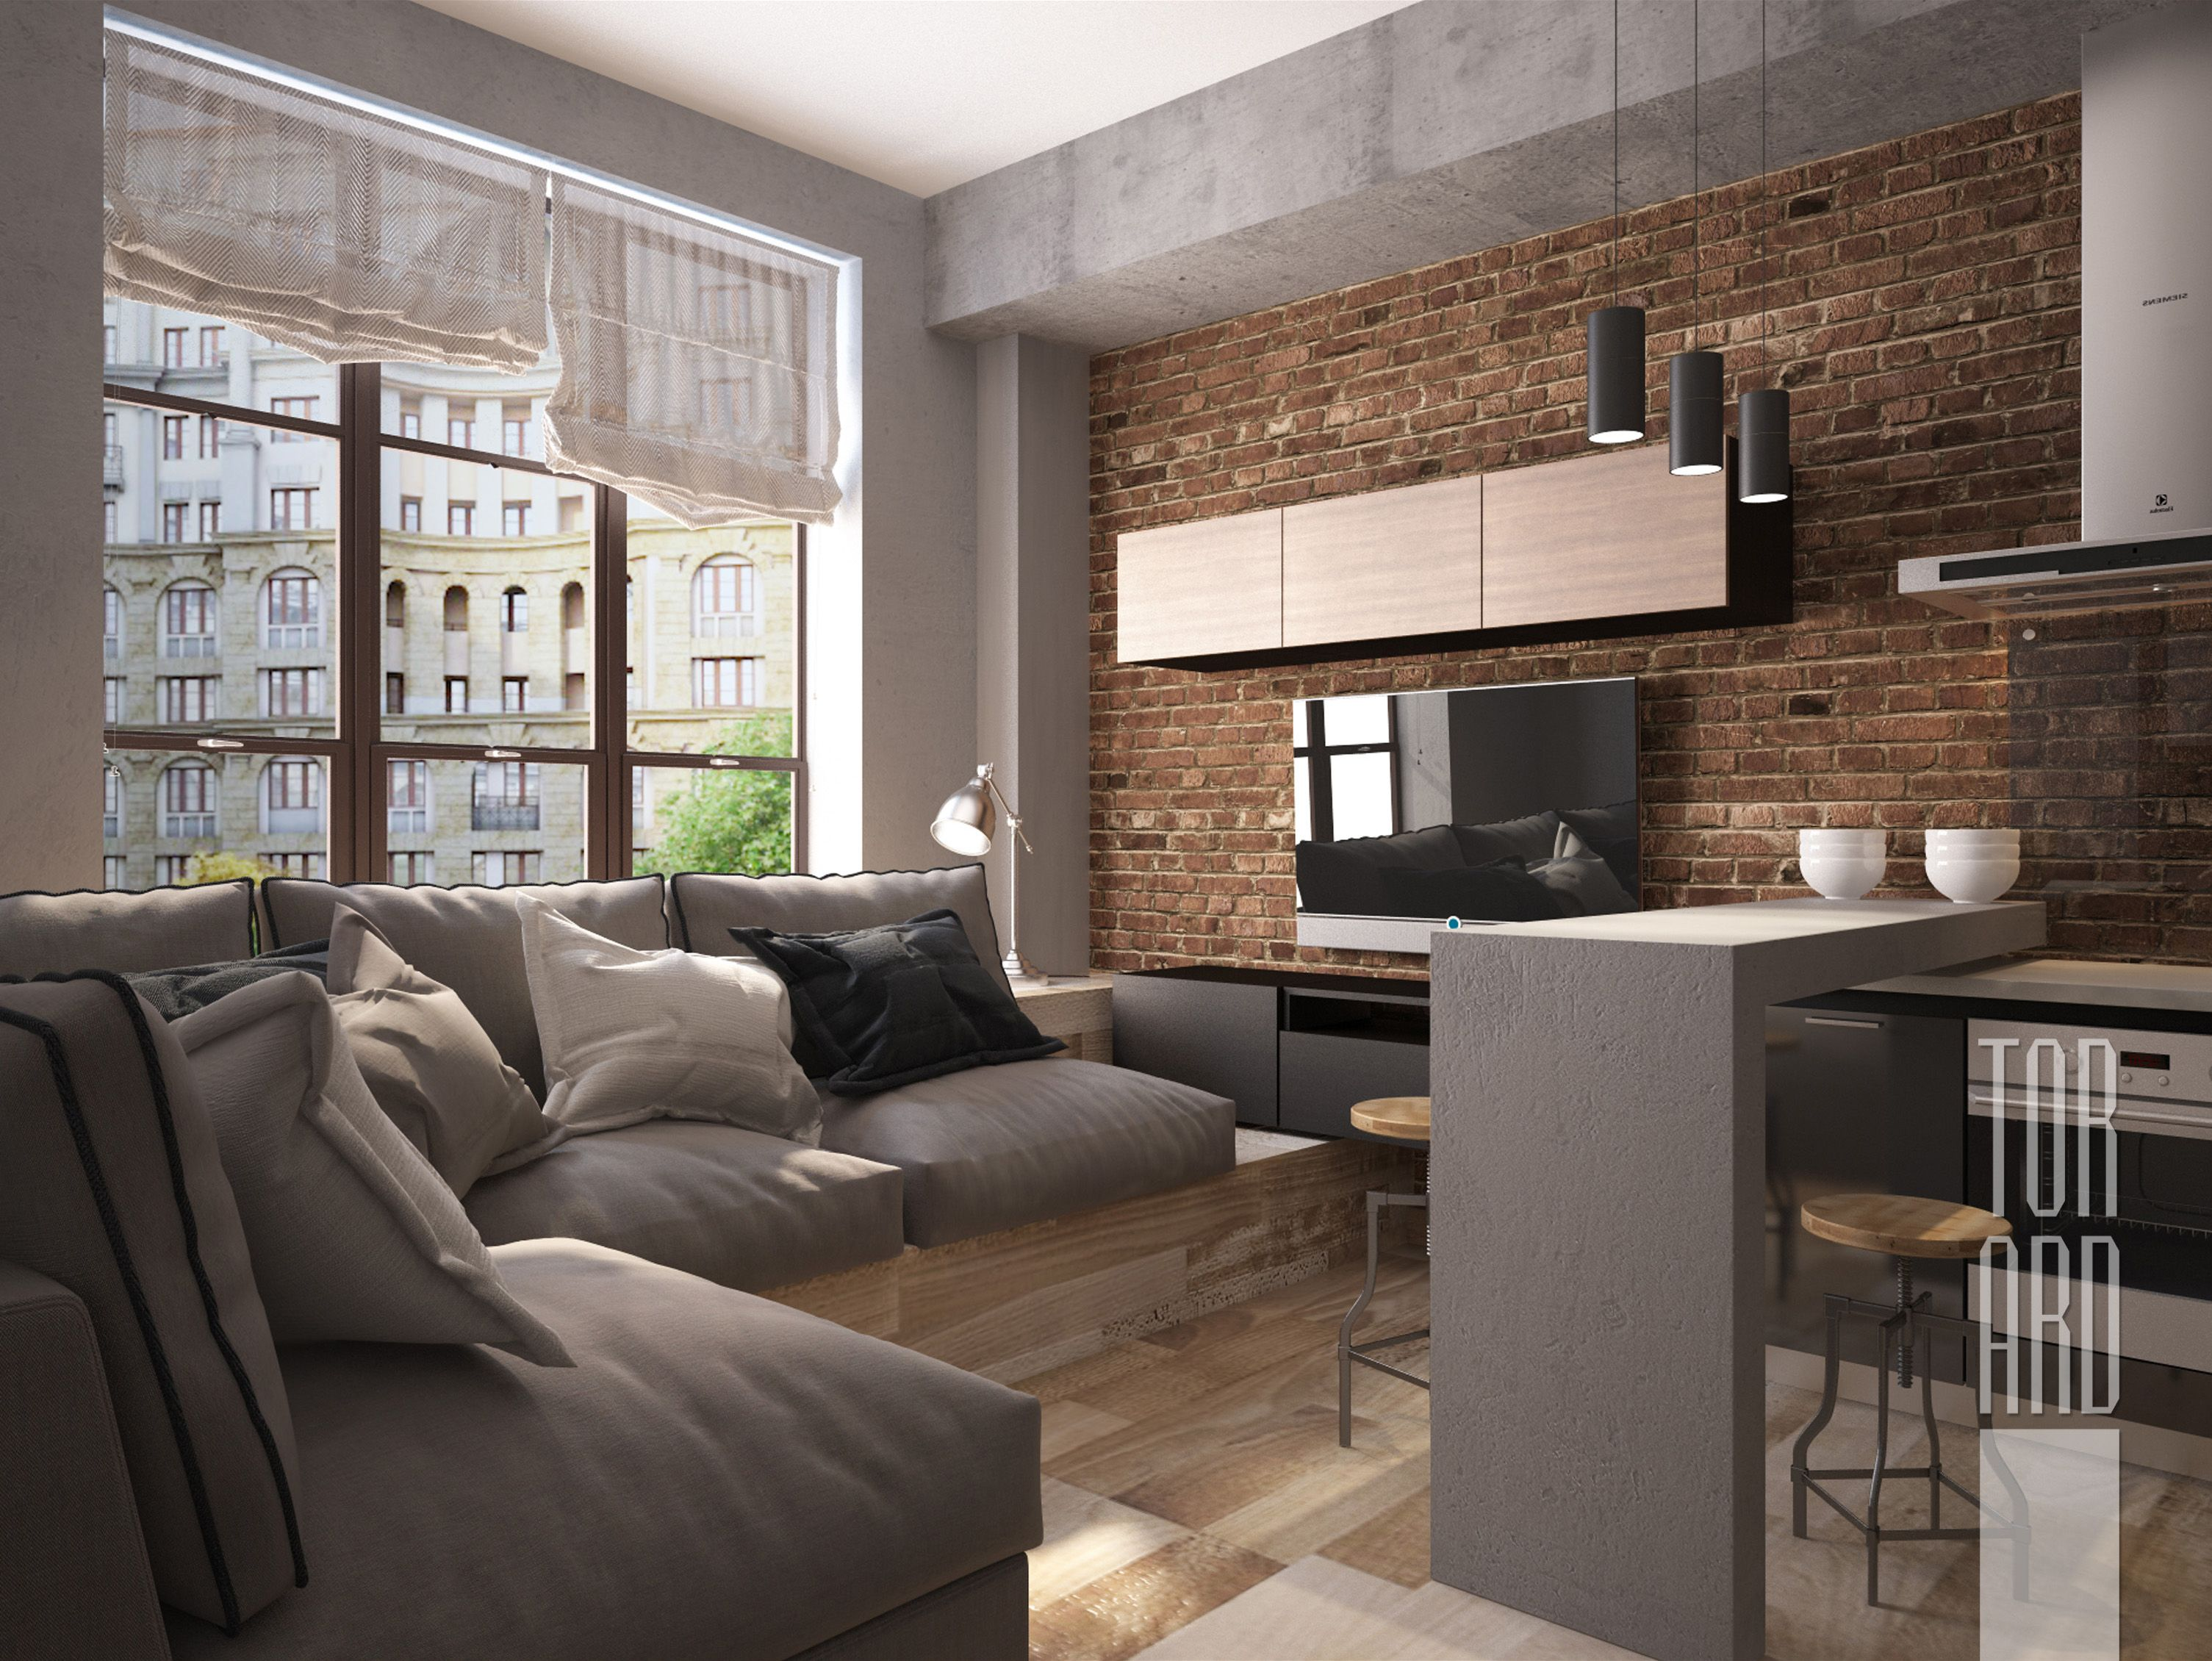 Brick Loft Apartment loft apartments in moscow • brick wall • living room • bachelor